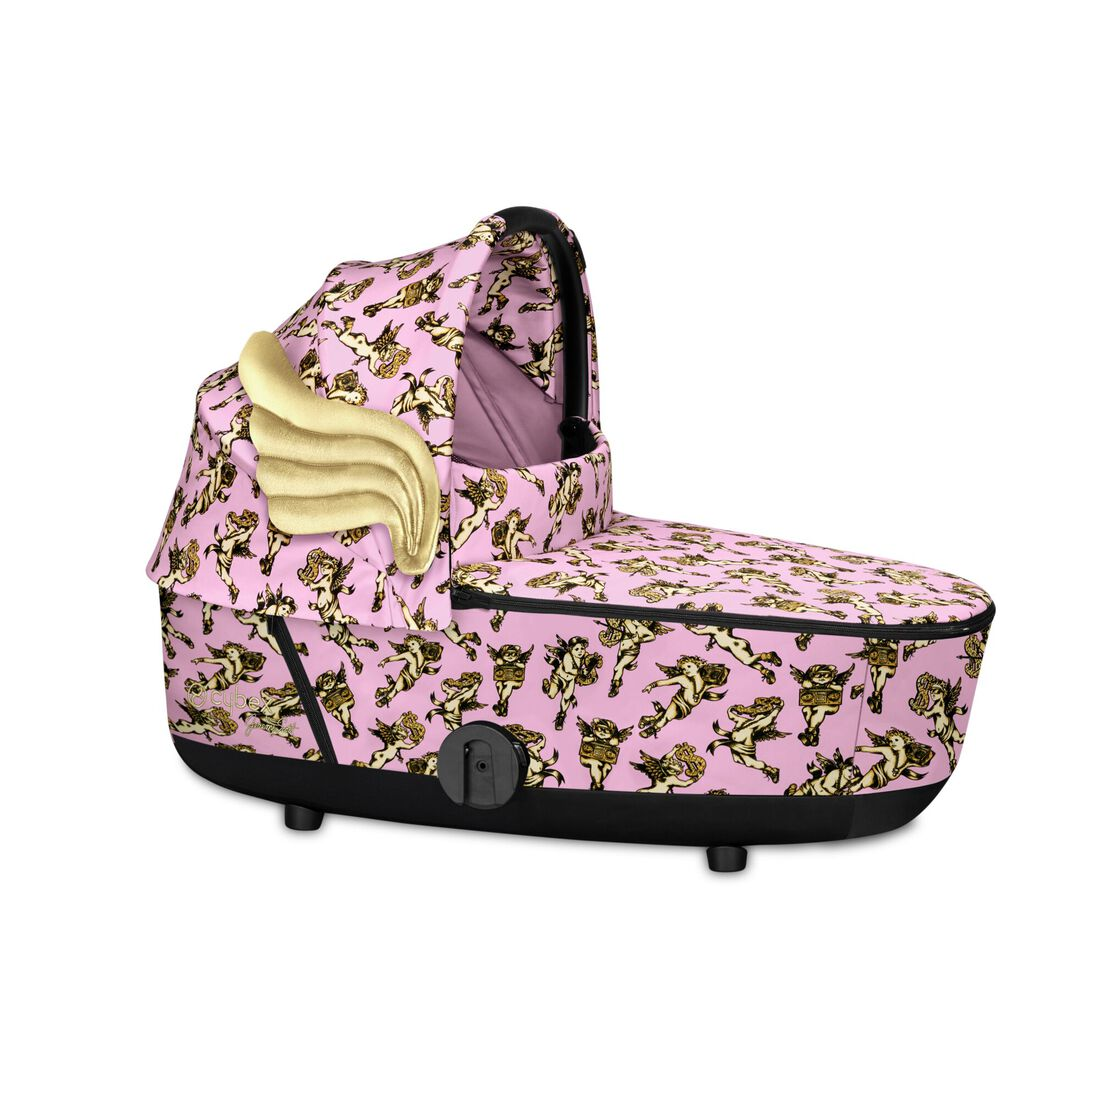 CYBEX Mios Lux Carry Cot - Cherubs Pink in Cherubs Pink large Bild 1